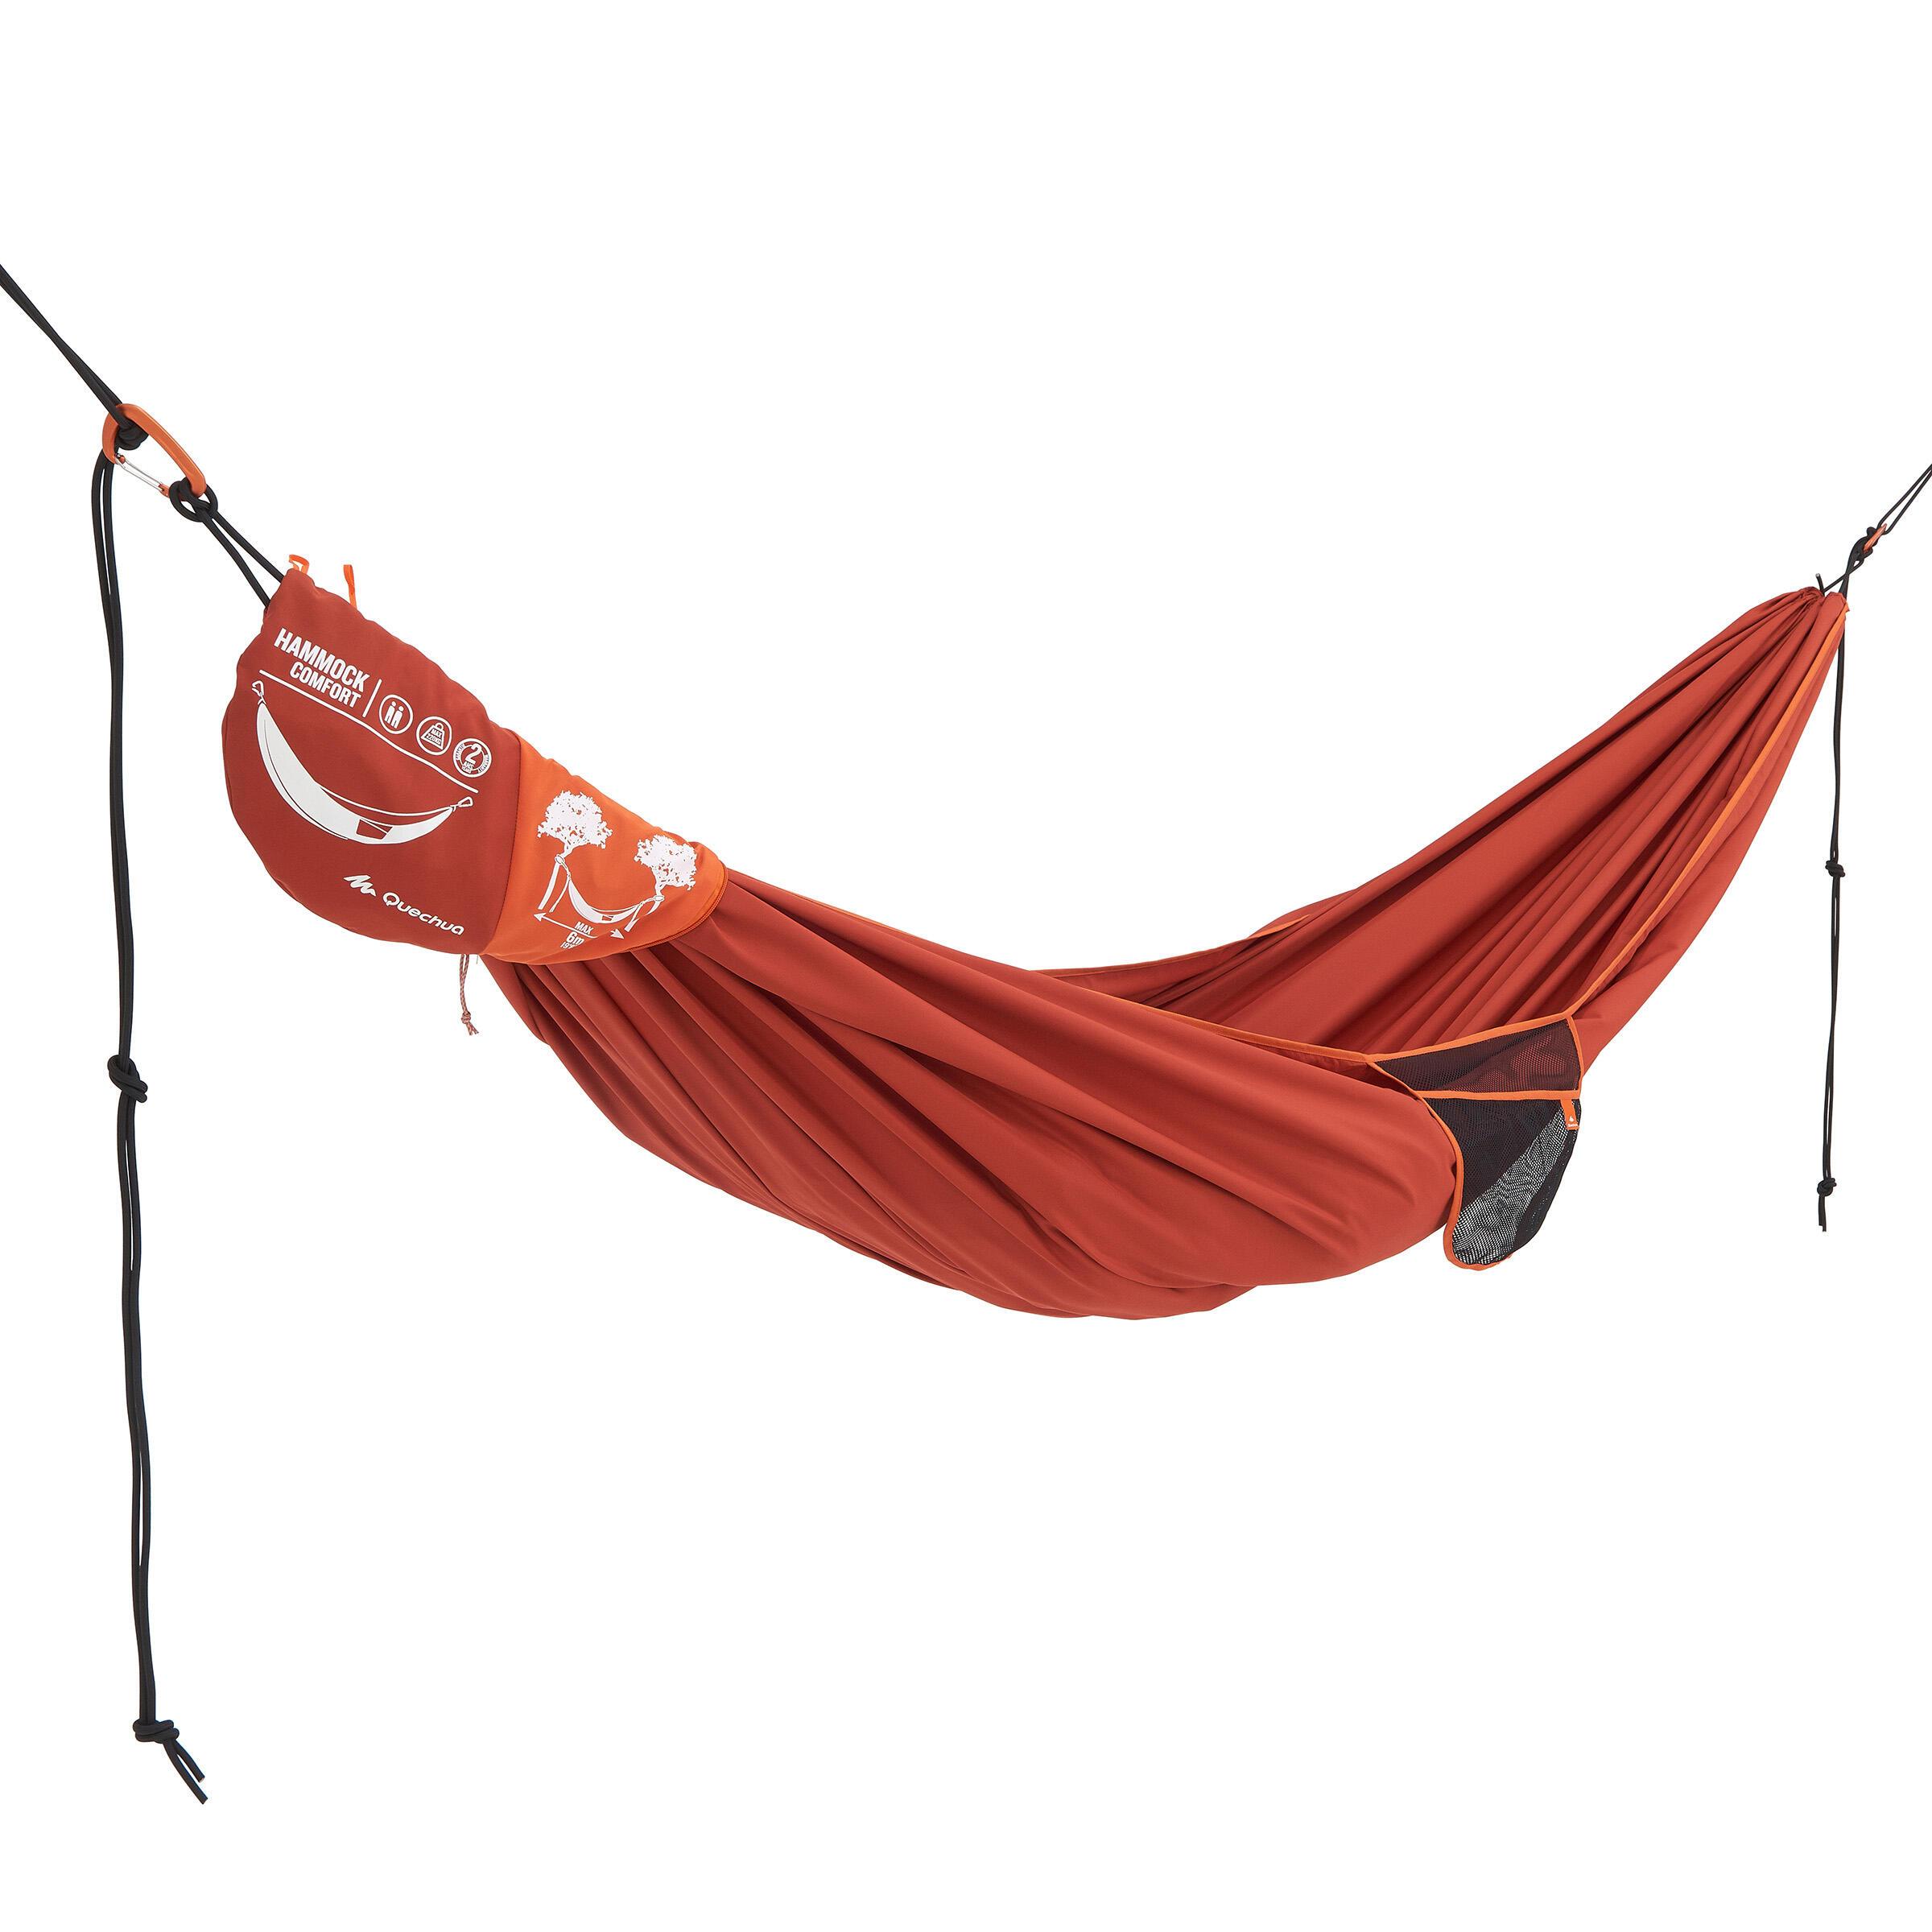 set hammock travel designed hammocks camping lightweight for products